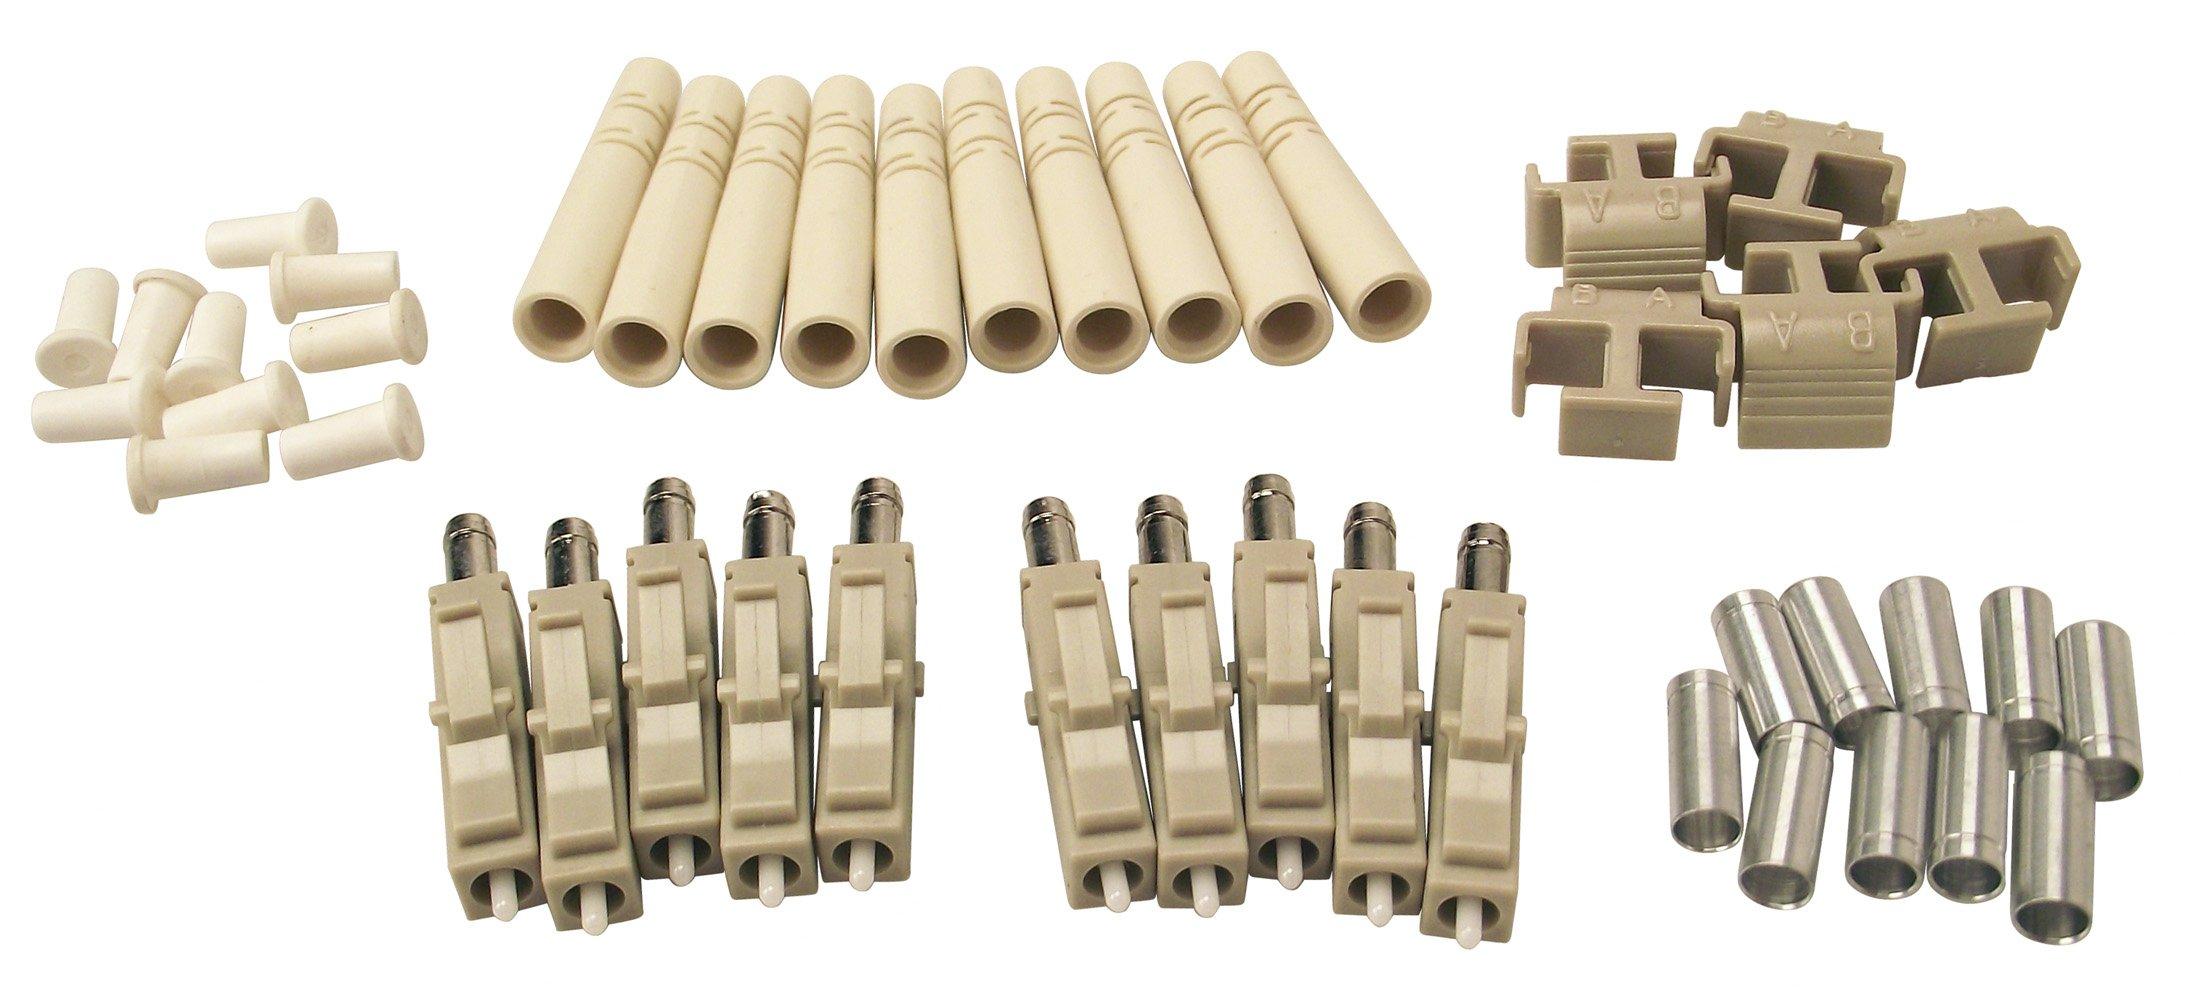 Shaxon FCLC-MM-10-B, LC Fiber Optic Connectors, Multimode, 10 Pack by Shaxon